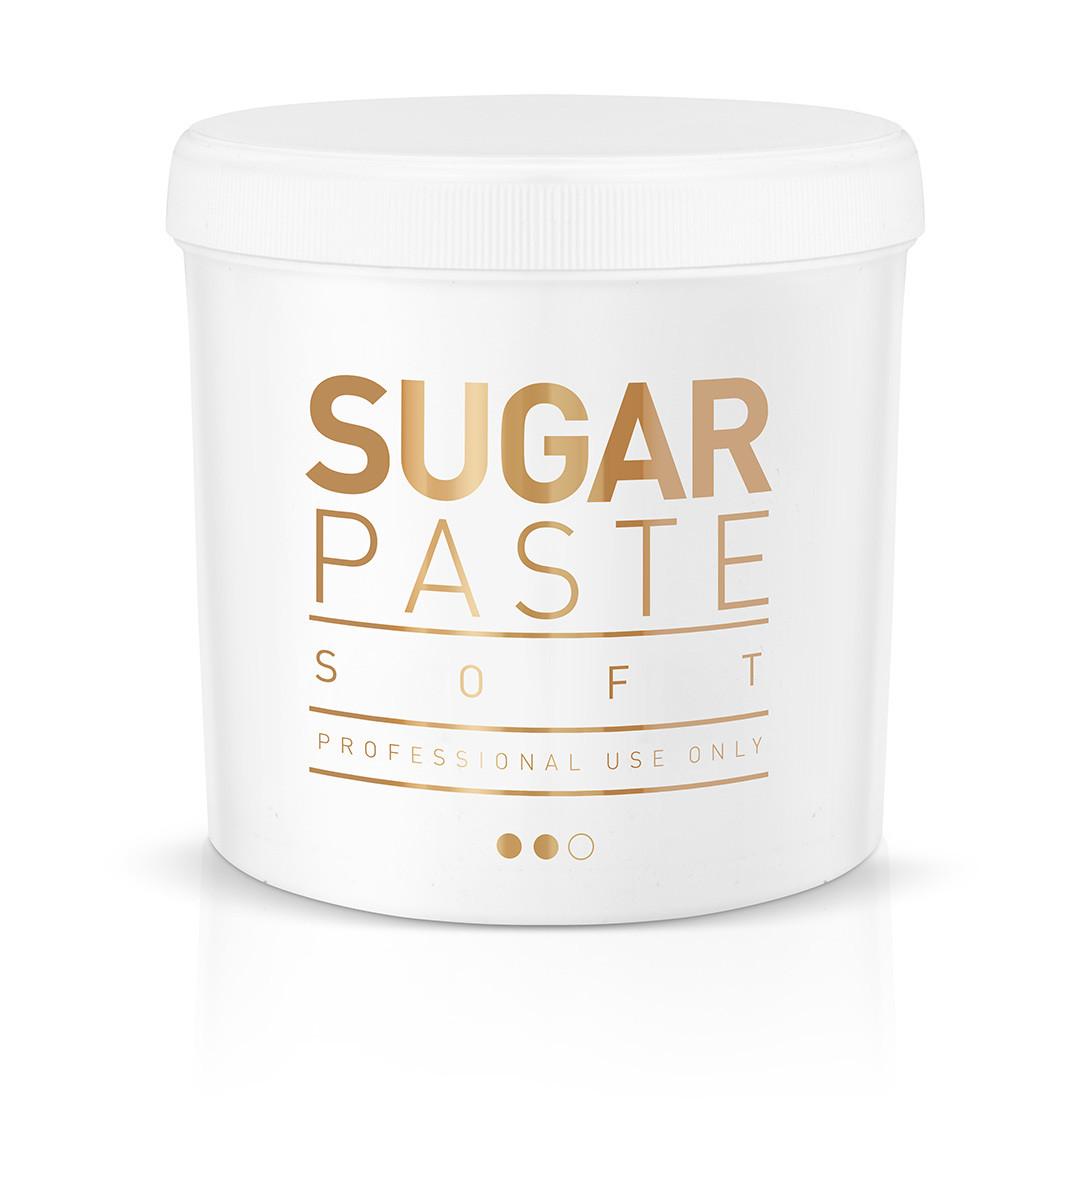 DERMAEPIL SOFT, шугарин, сахарная паста, депиляция сахаром, Воск сахарная паста